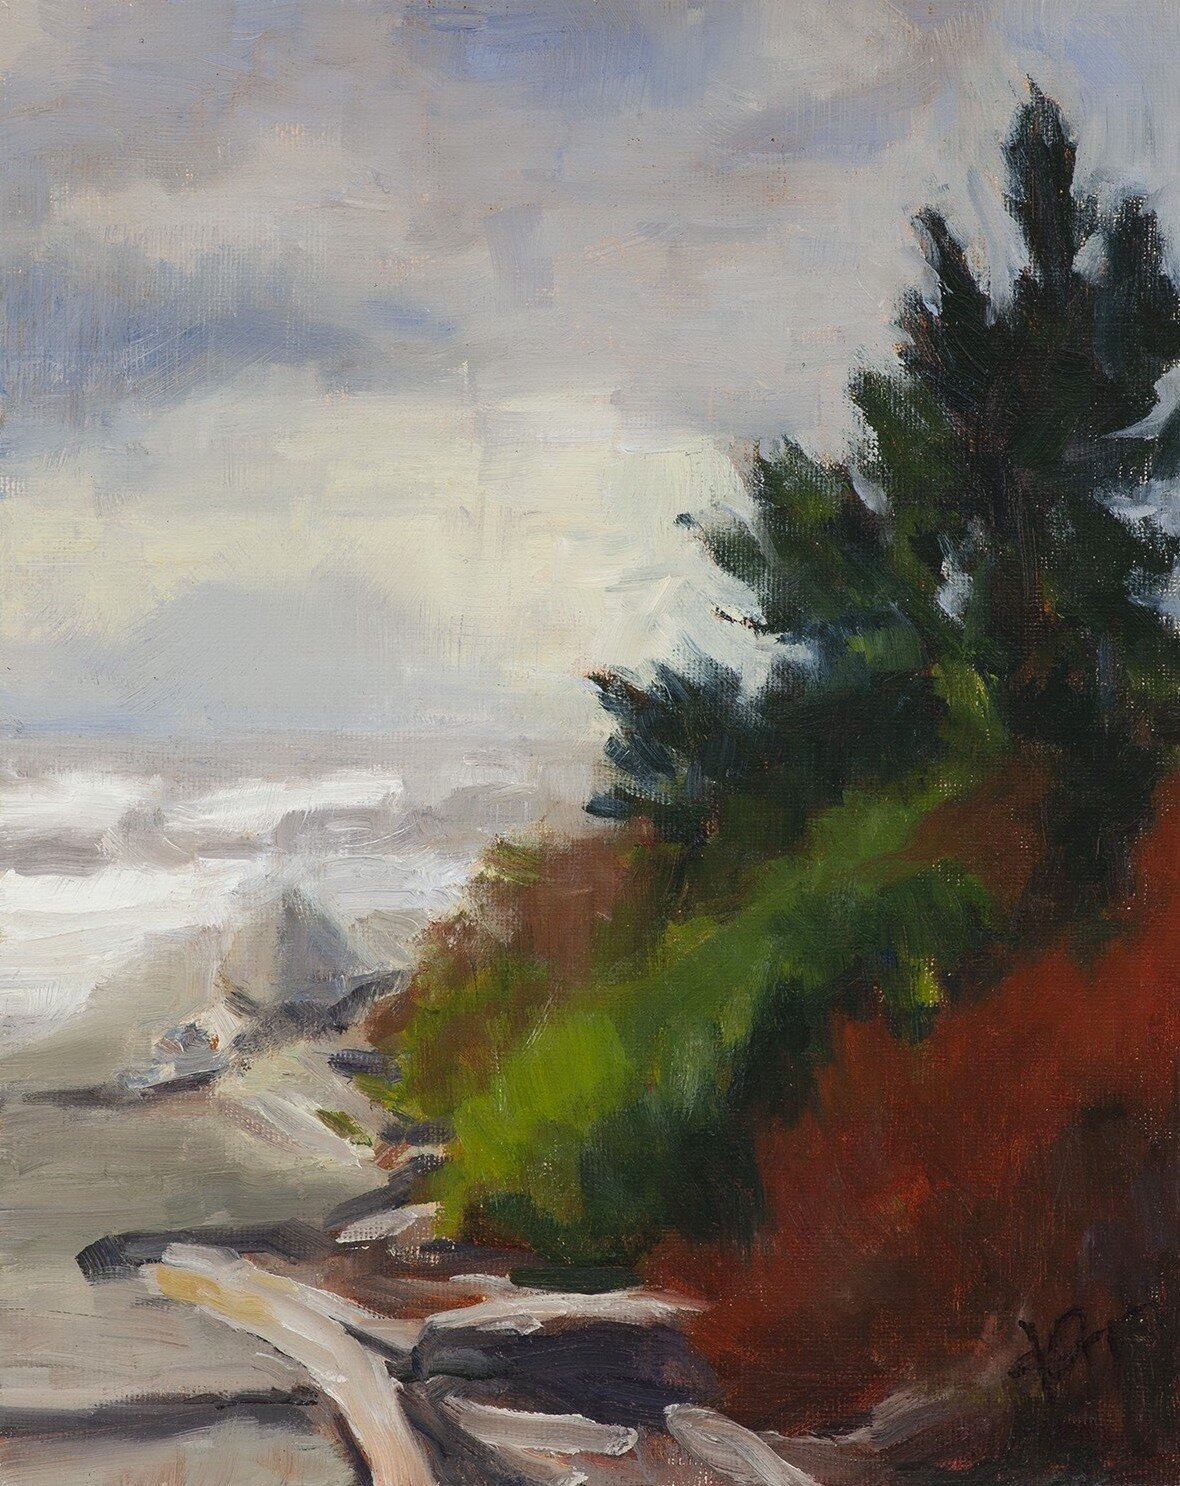 Darcy Orr, Landscape Painting, SVFAL-005.jpg